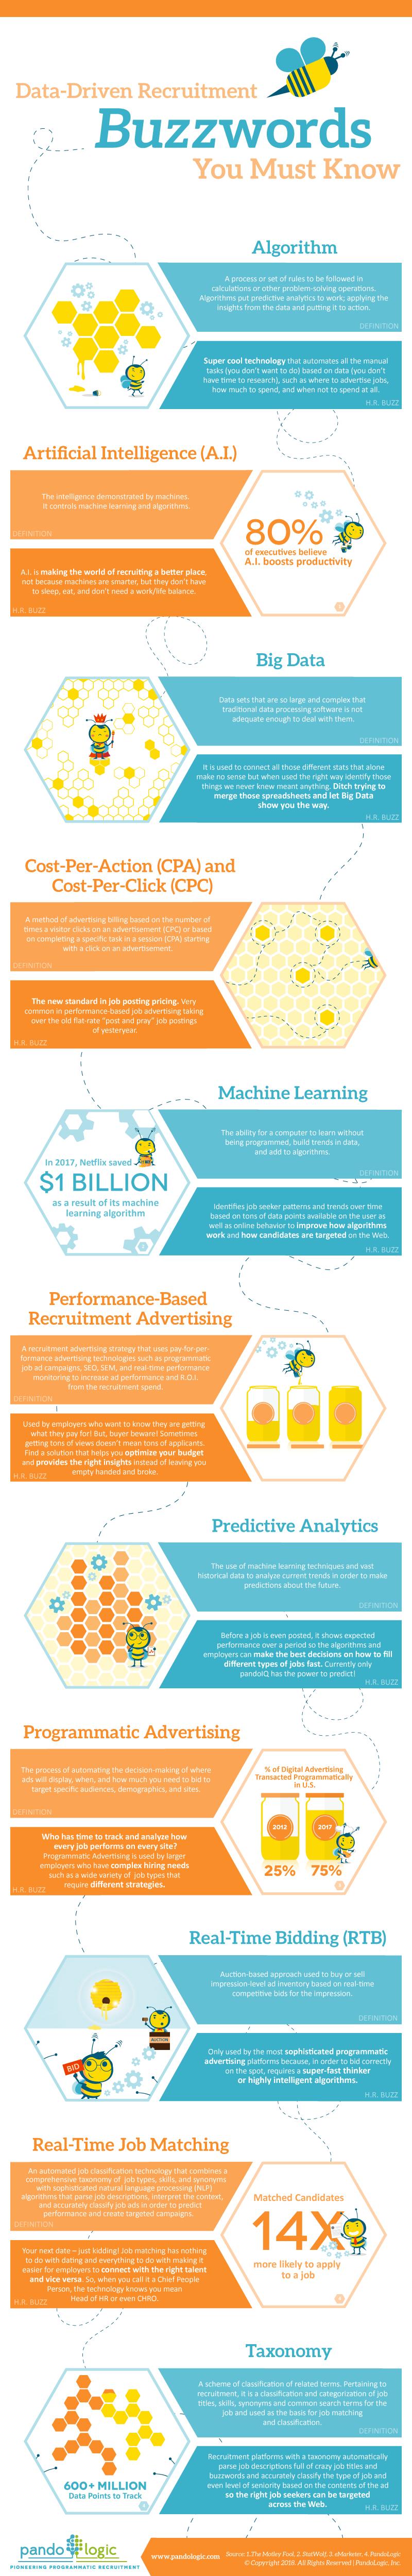 data-driven recruitment